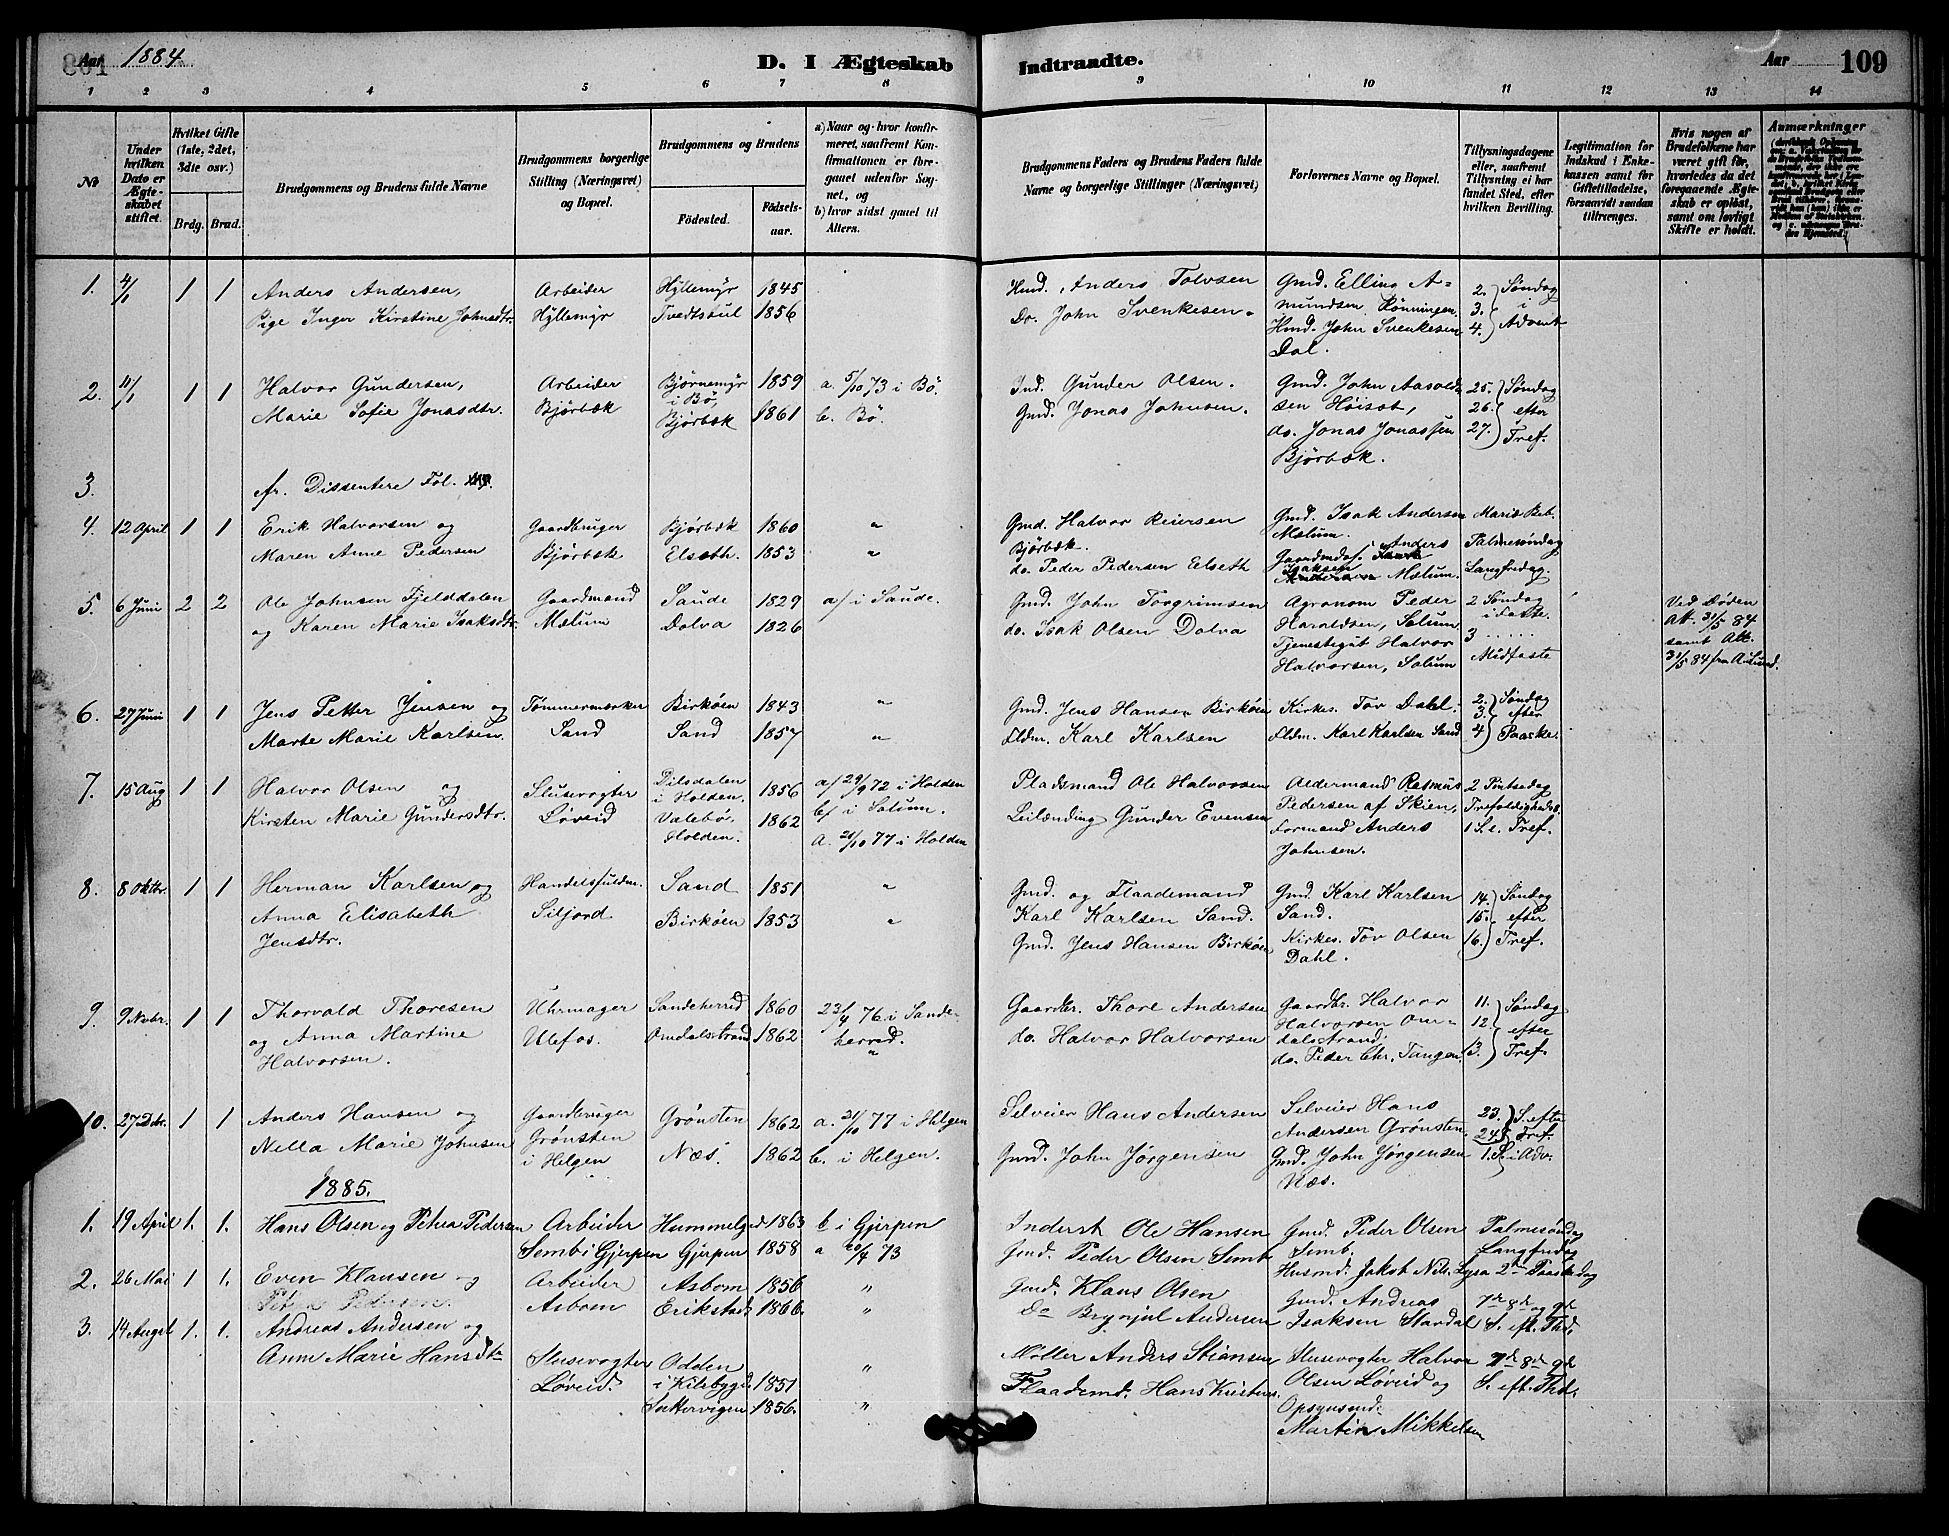 SAKO, Solum kirkebøker, G/Gb/L0003: Klokkerbok nr. II 3, 1880-1898, s. 109